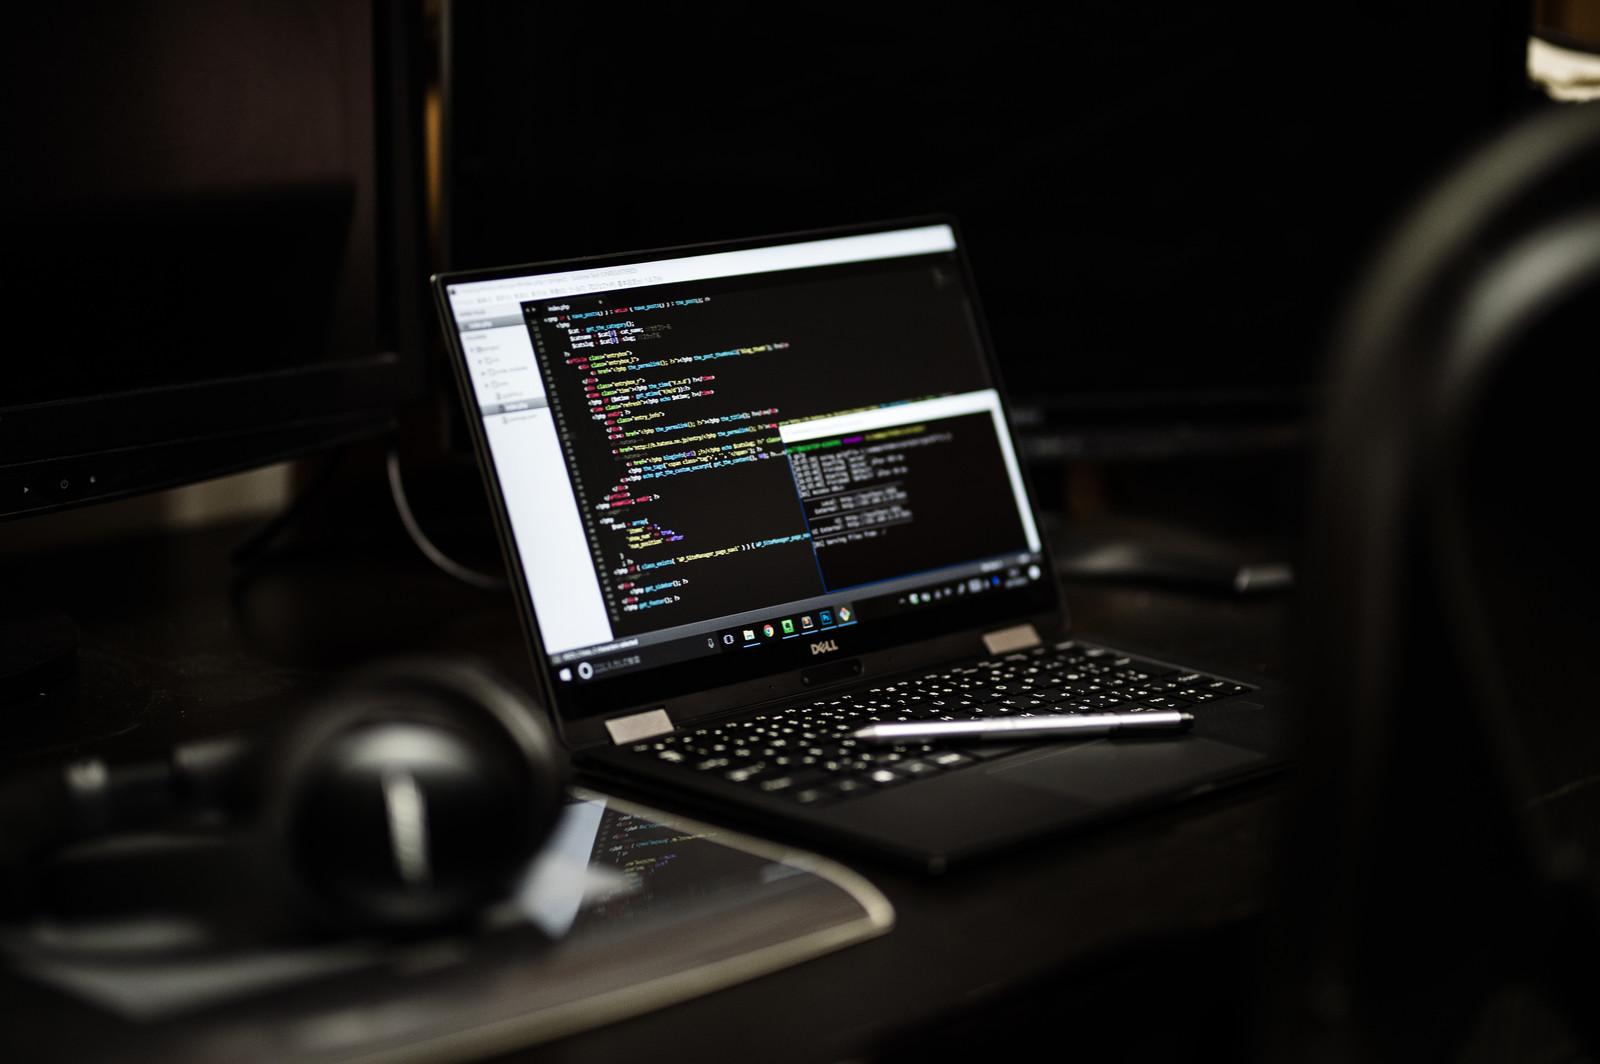 hostsファイルを編集してアクセスを変更する方法